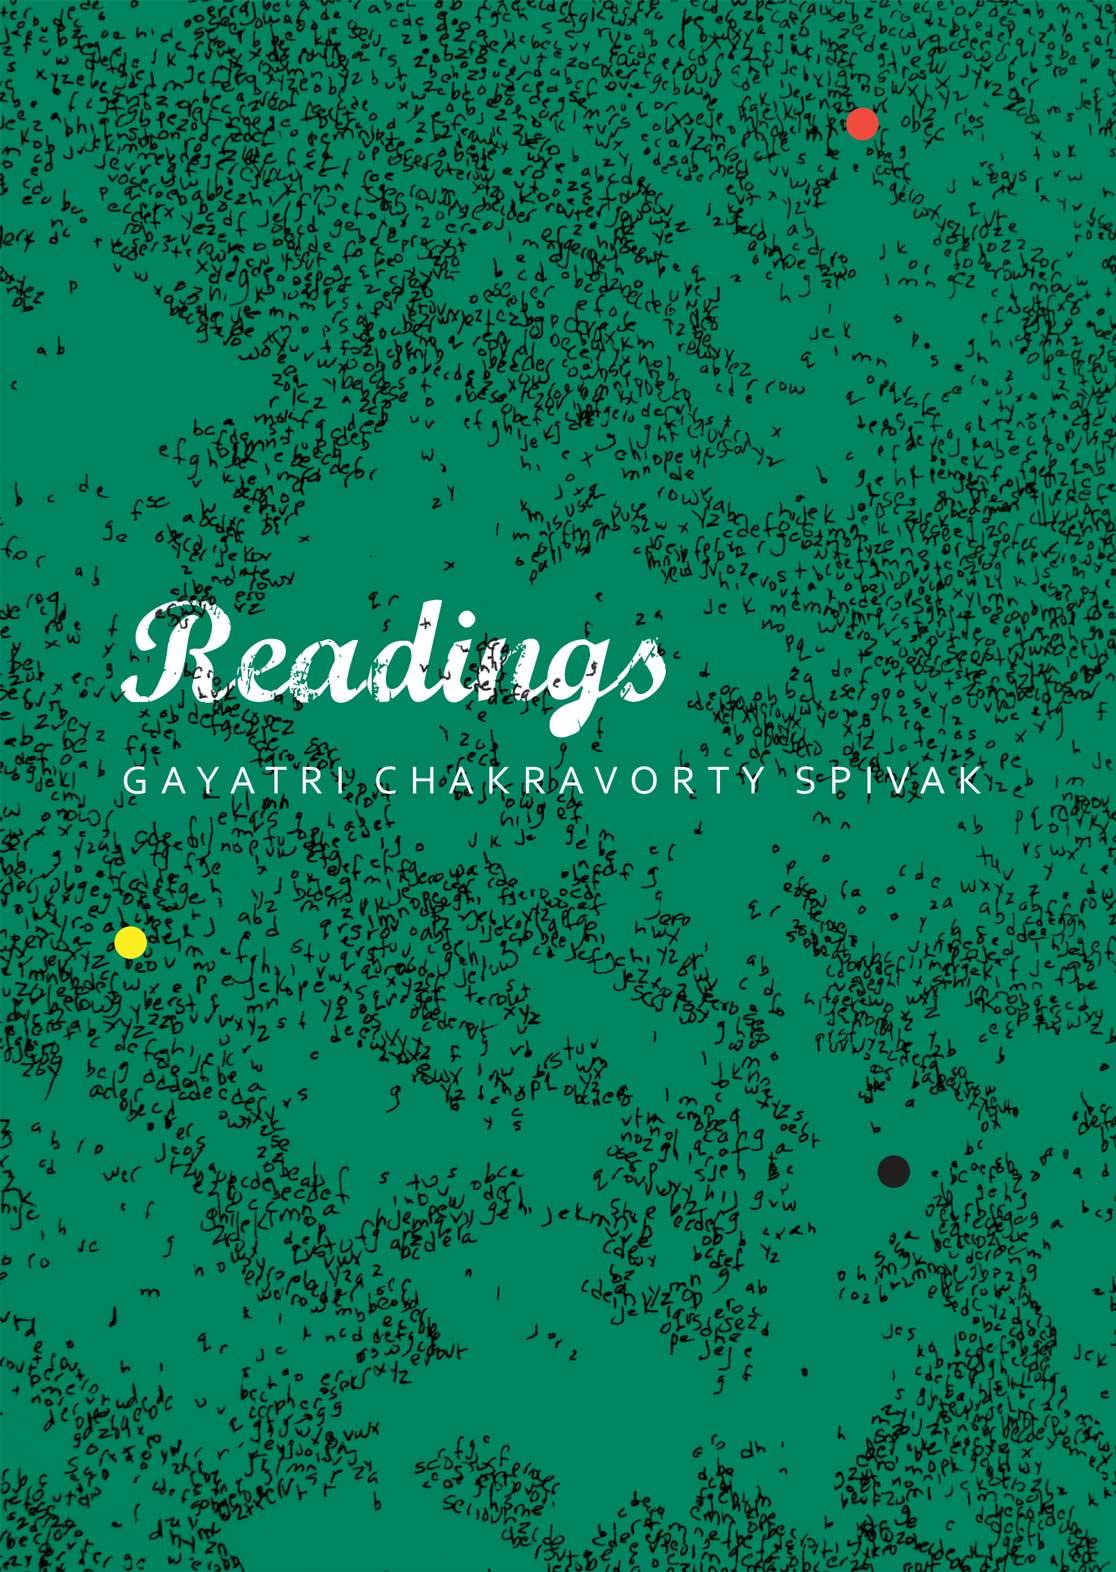 Readings by Gayatri Chakravorty Spivak   Seagull Books